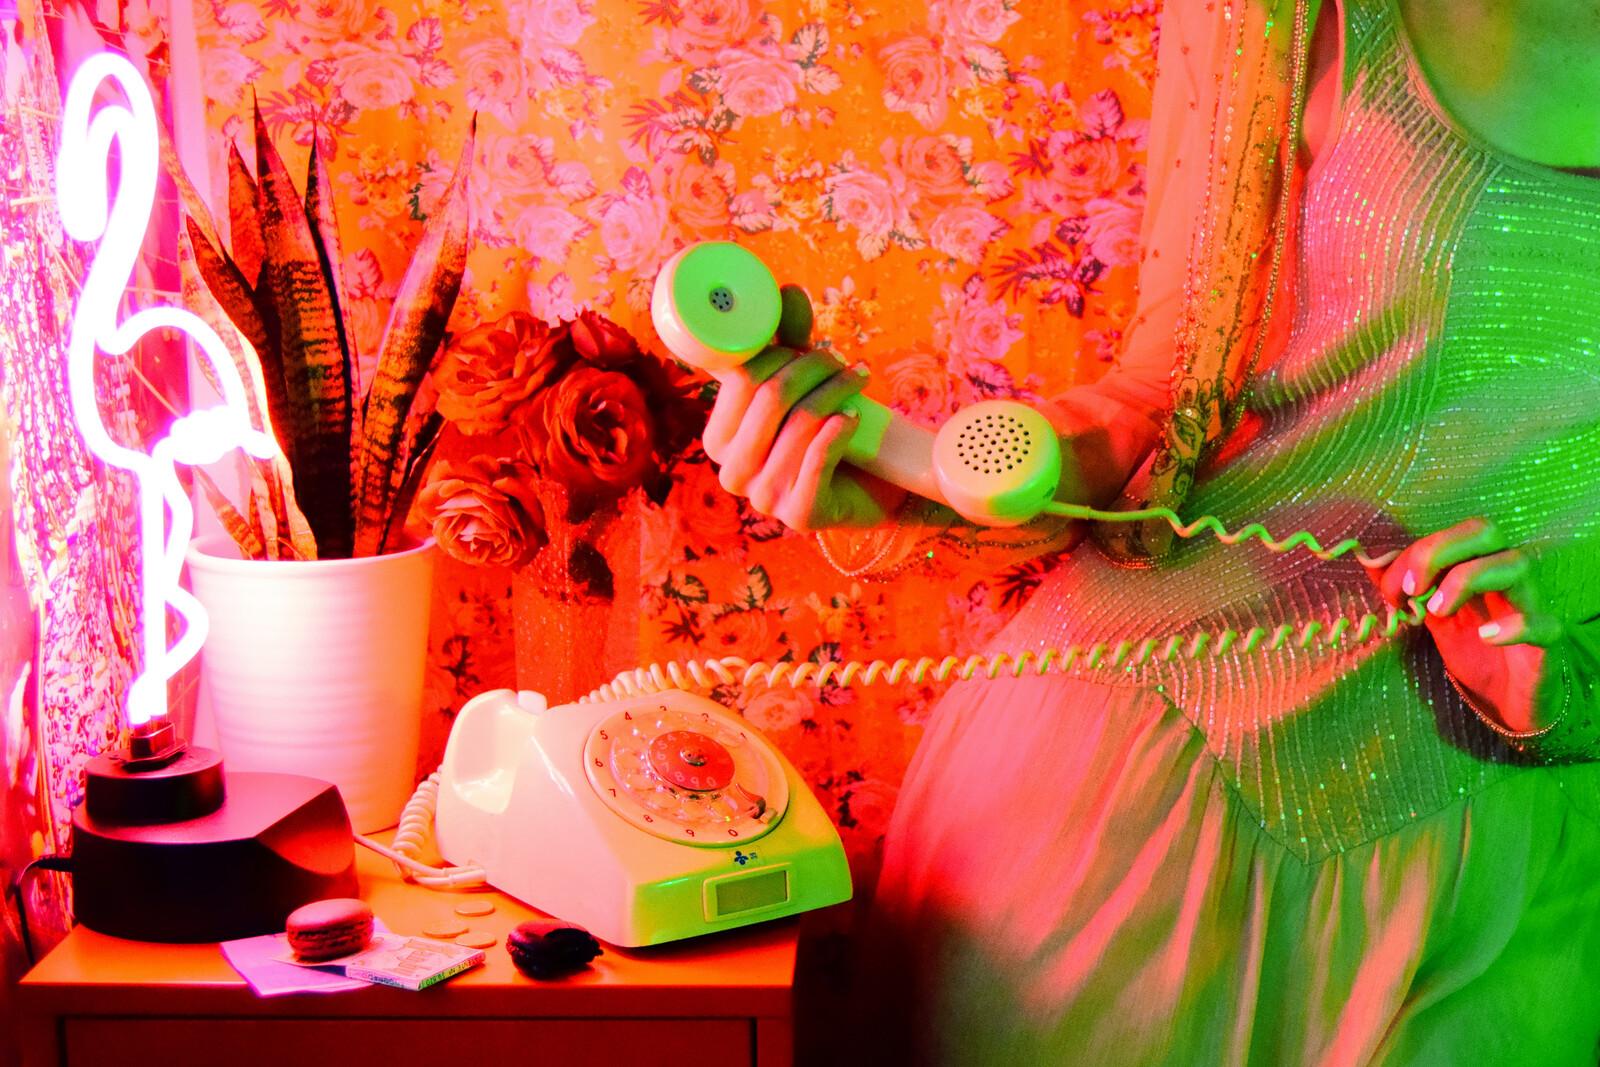 Phone booth - Sonja L.